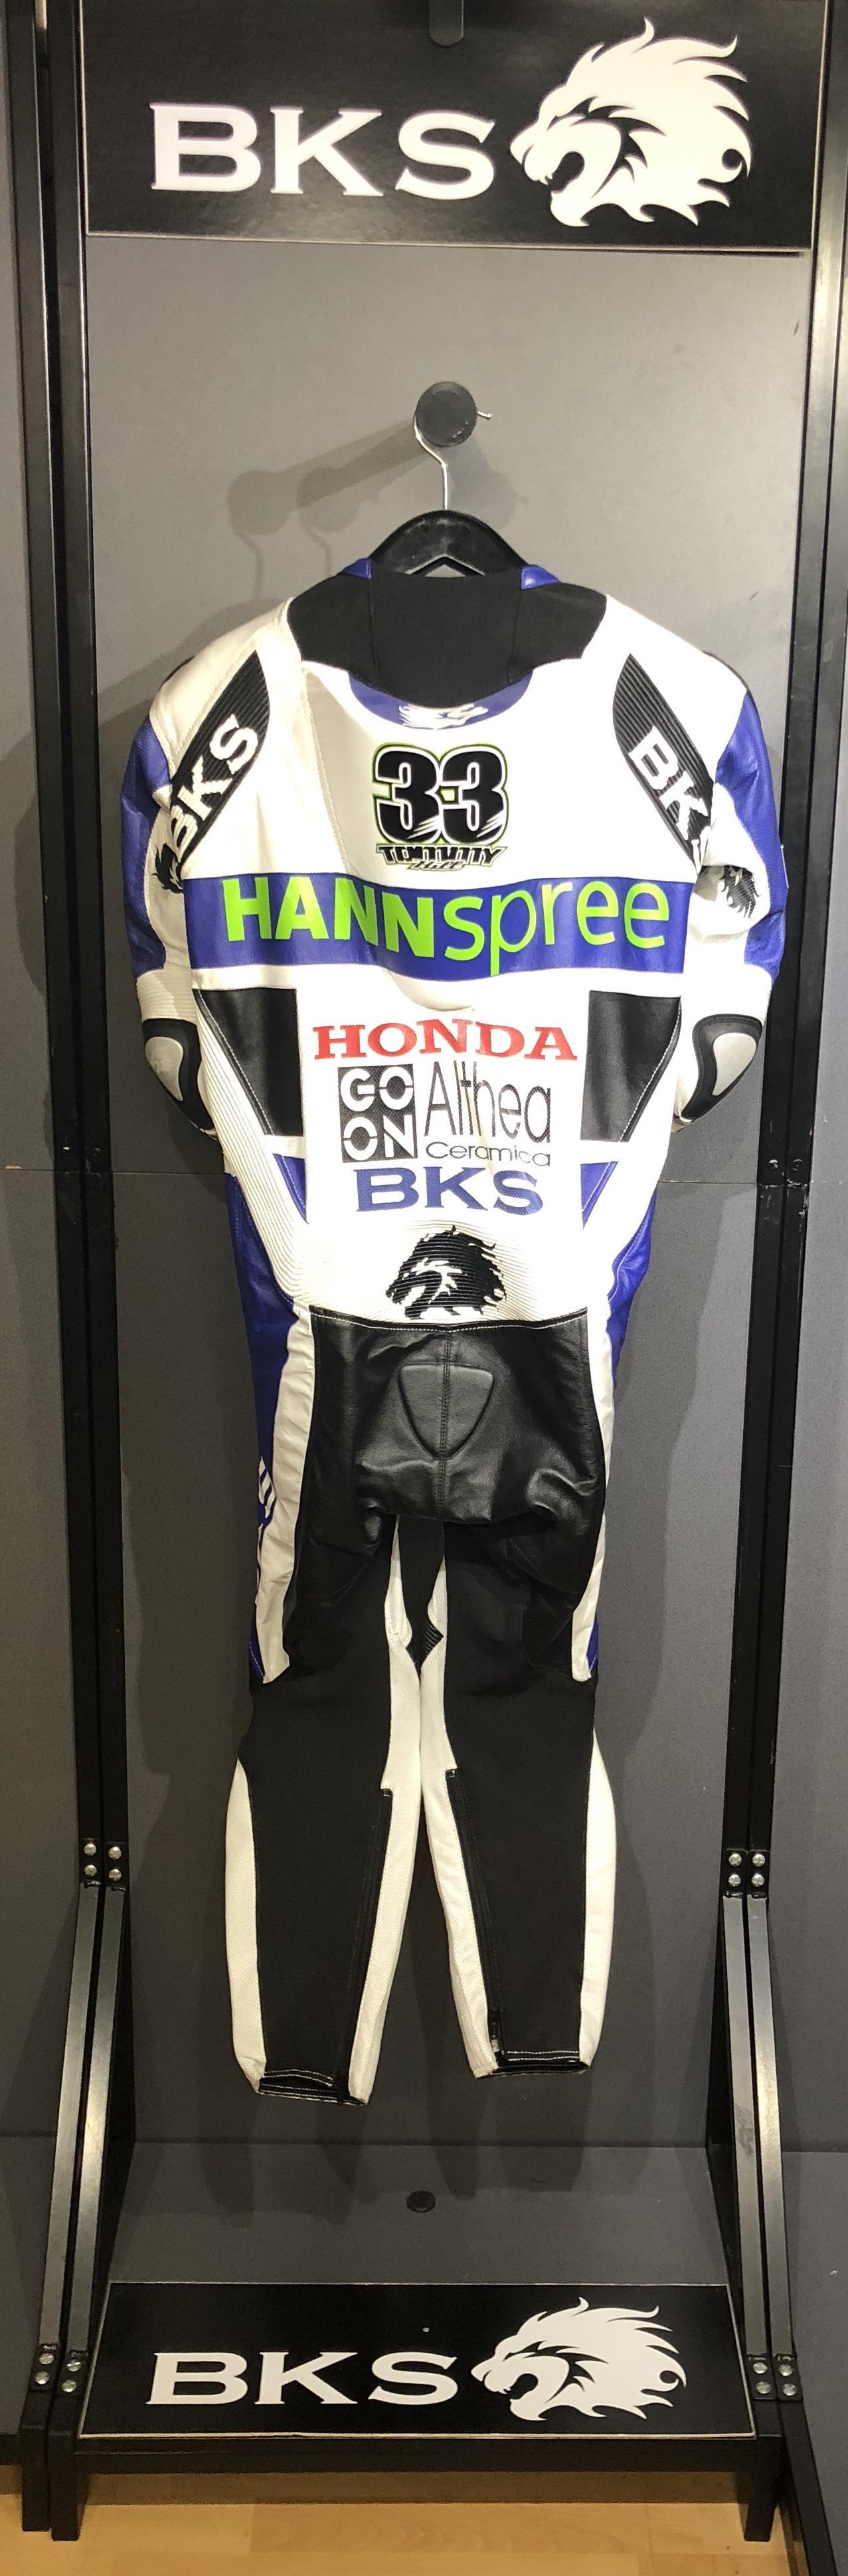 e8fa8c56 Tommy Hill World Superbike Honda suit | BKS Leather Shop